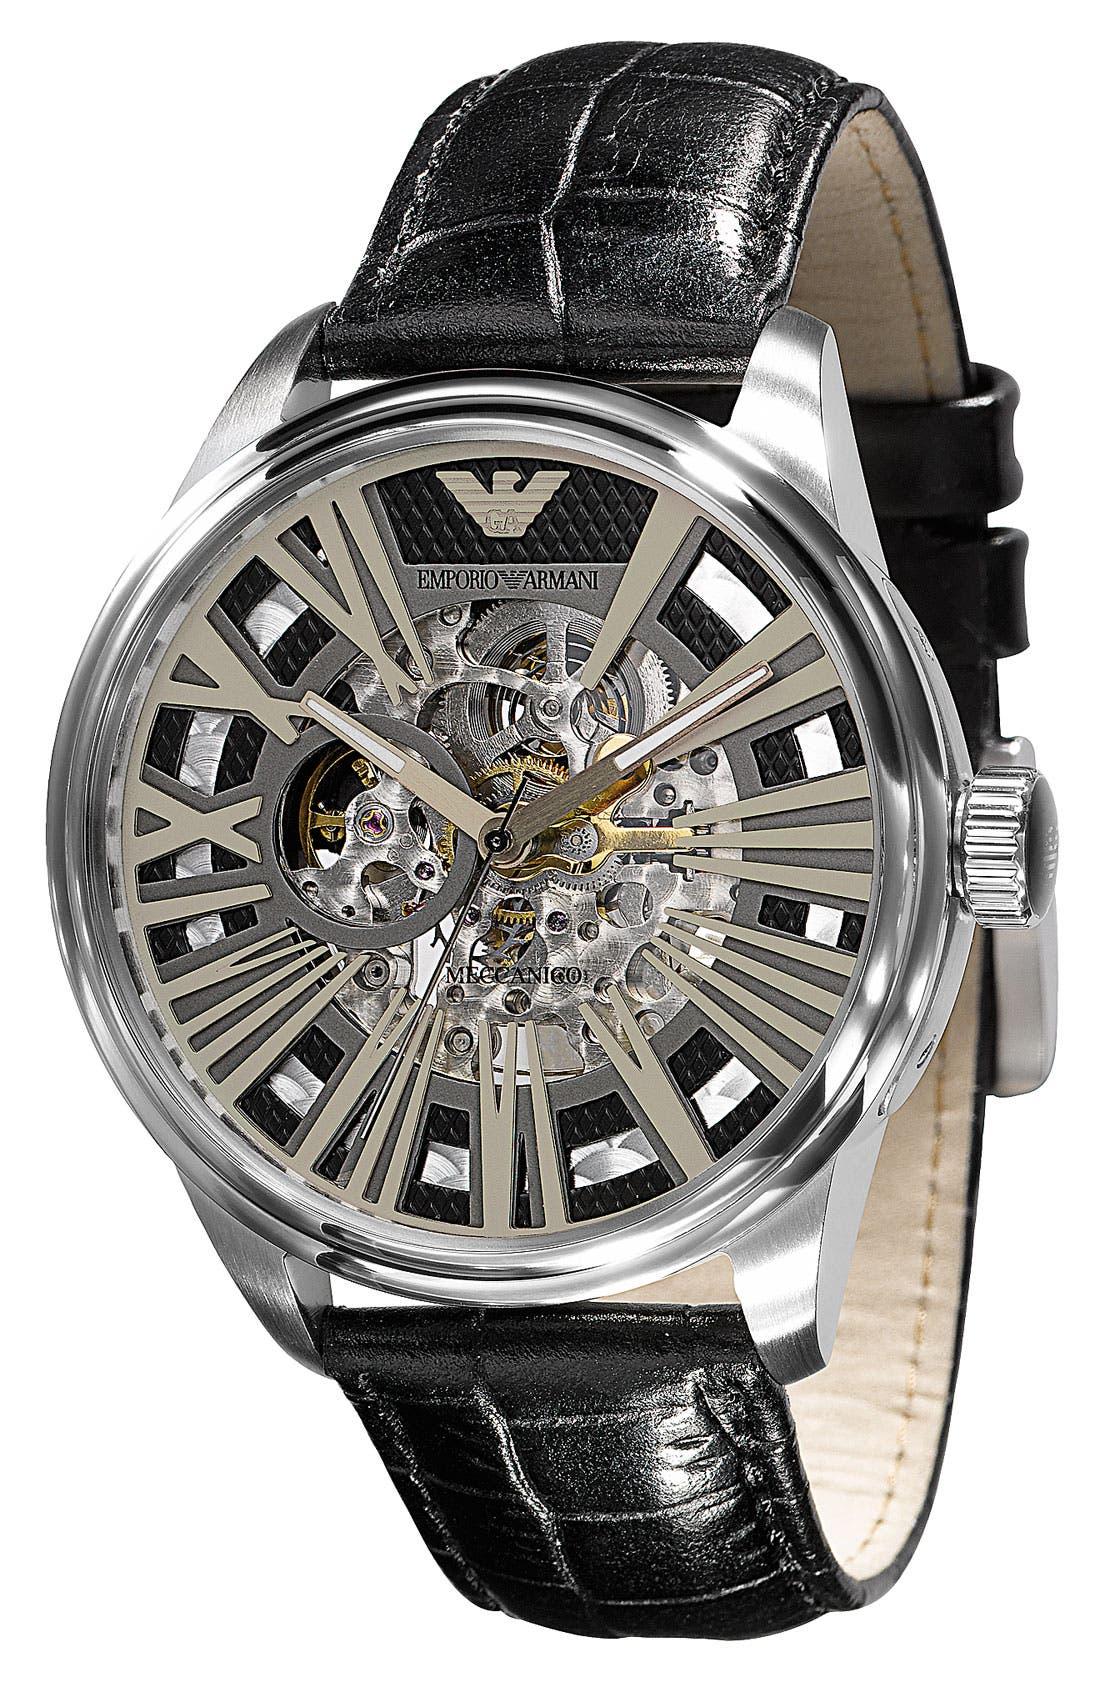 Main Image - Emporio Armani Automatic Leather Strap Watch